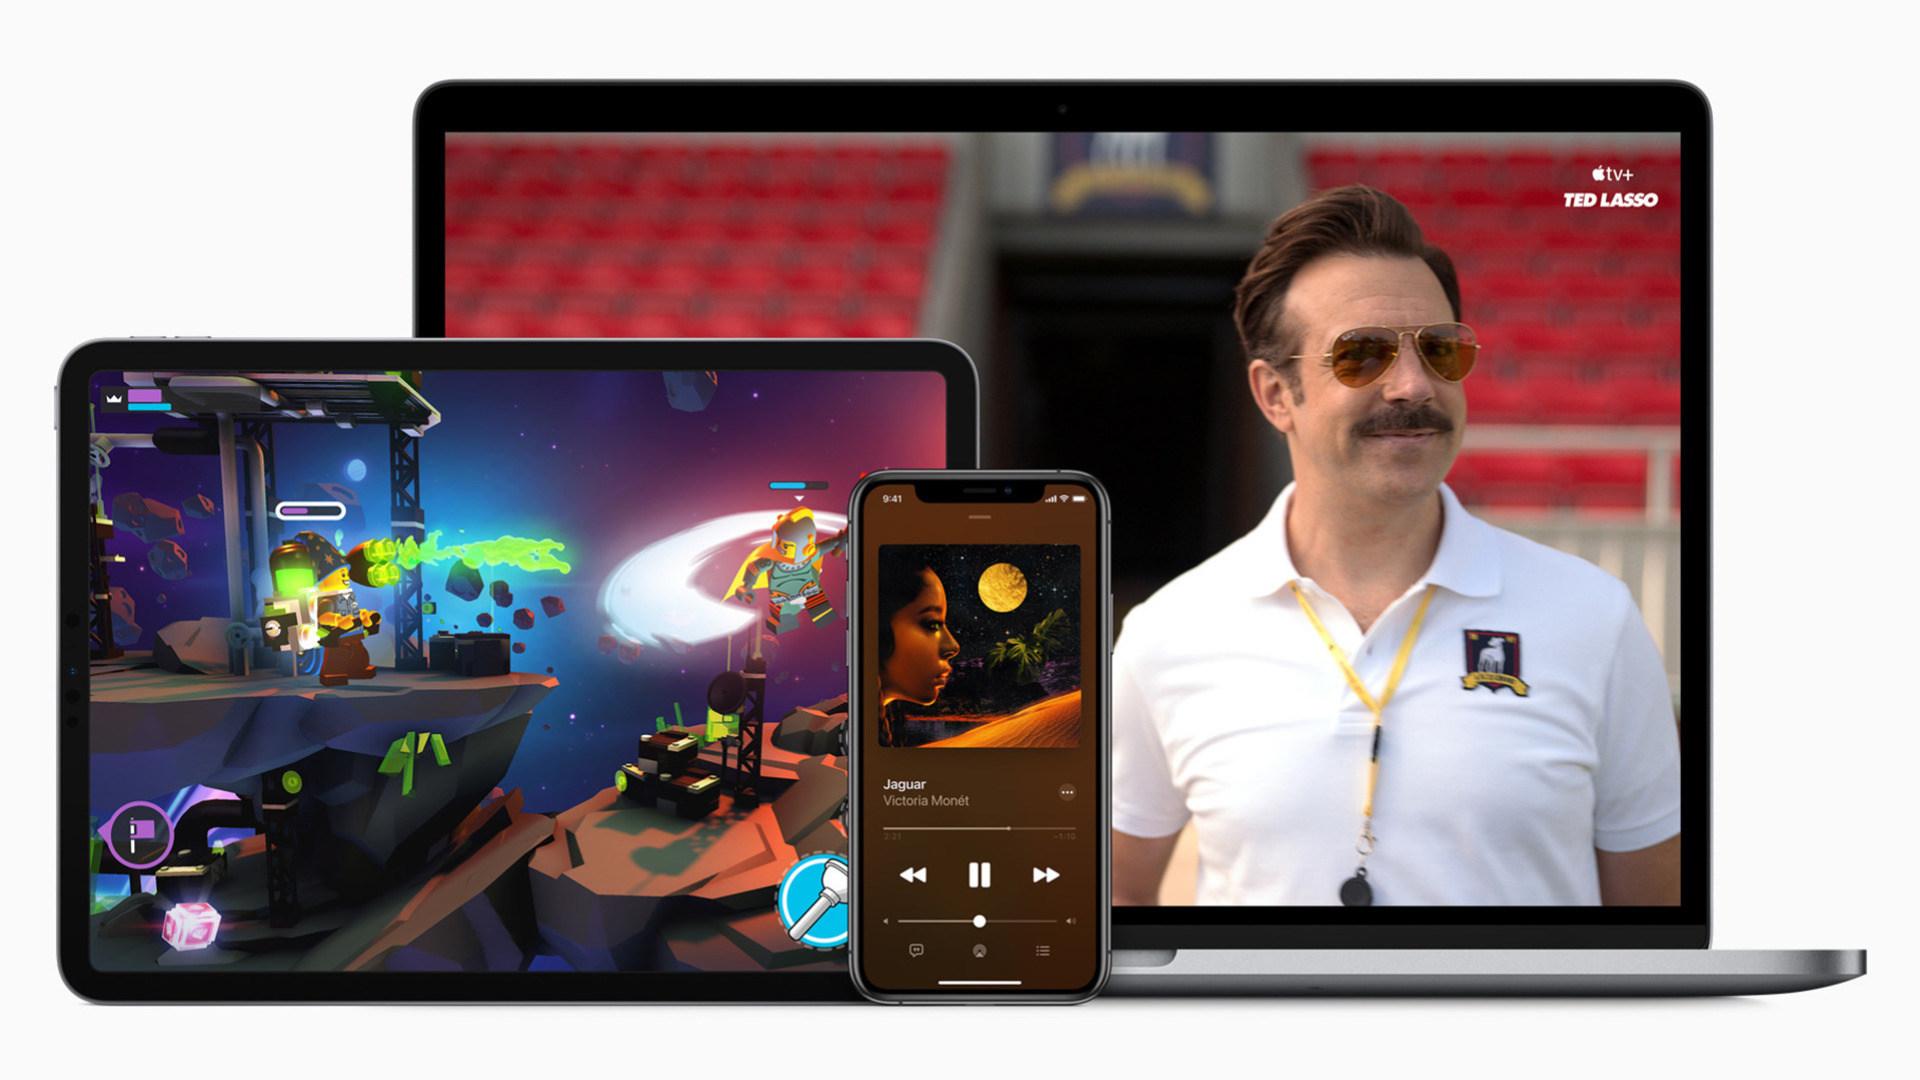 Apple, Abo, Abonnement, Apple Music, Apple TV+, Dienste, Services, Apple Arcade, Apple iCloud, Apple One